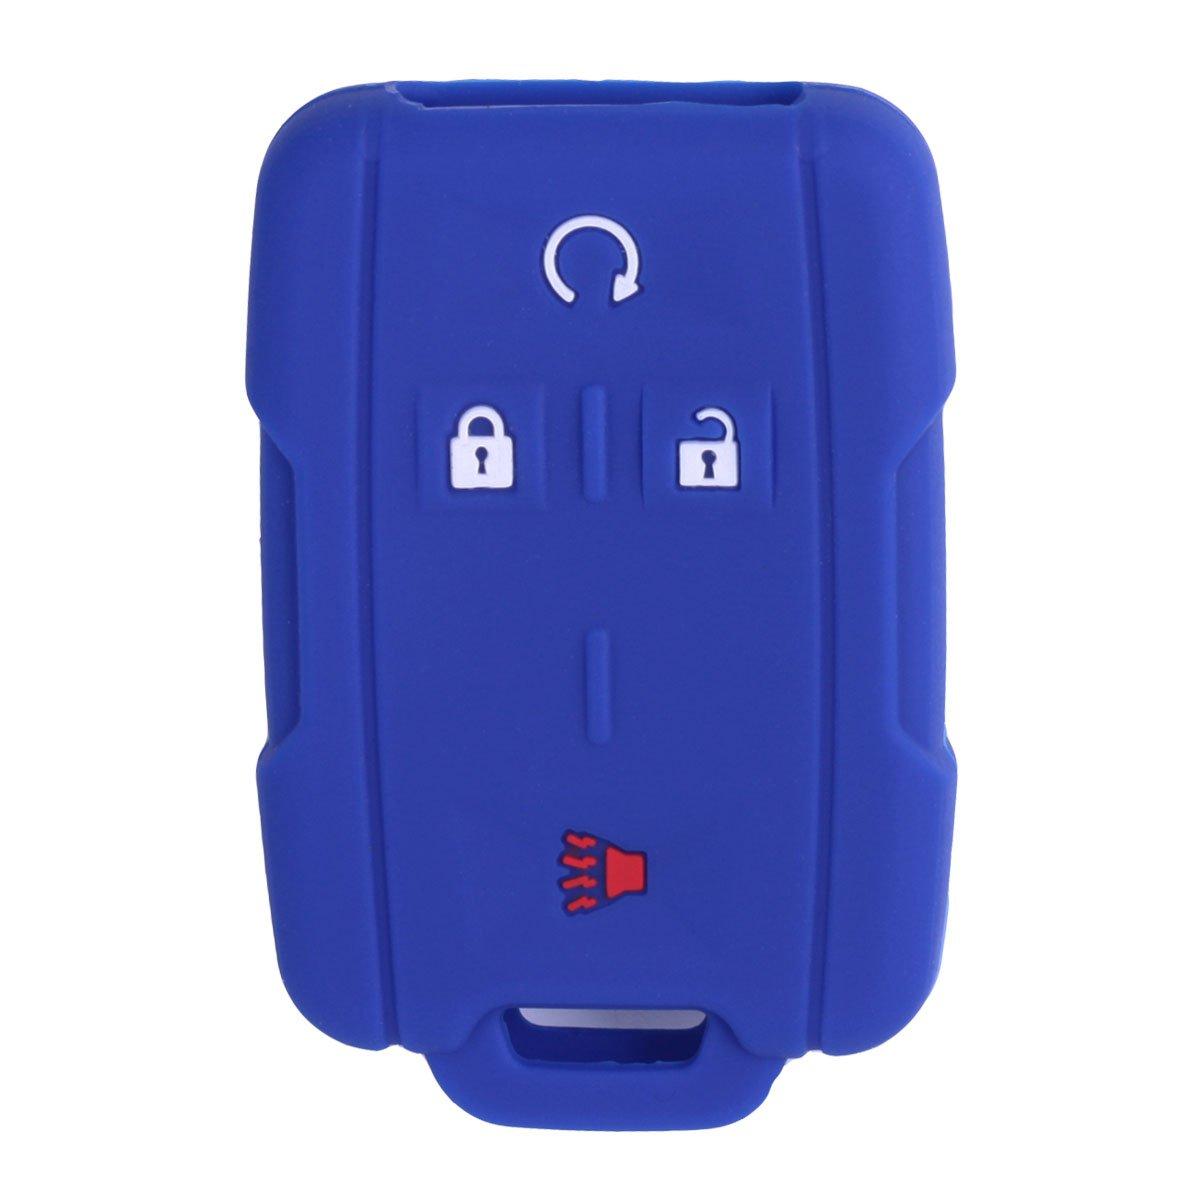 2Pcs XUHANG Sillicone key fob Skin key Cover Remote Case Protector Shell for Chevrolet Silverado Colorado GMC Sierra Yukon Cadillac smart Remote black blue